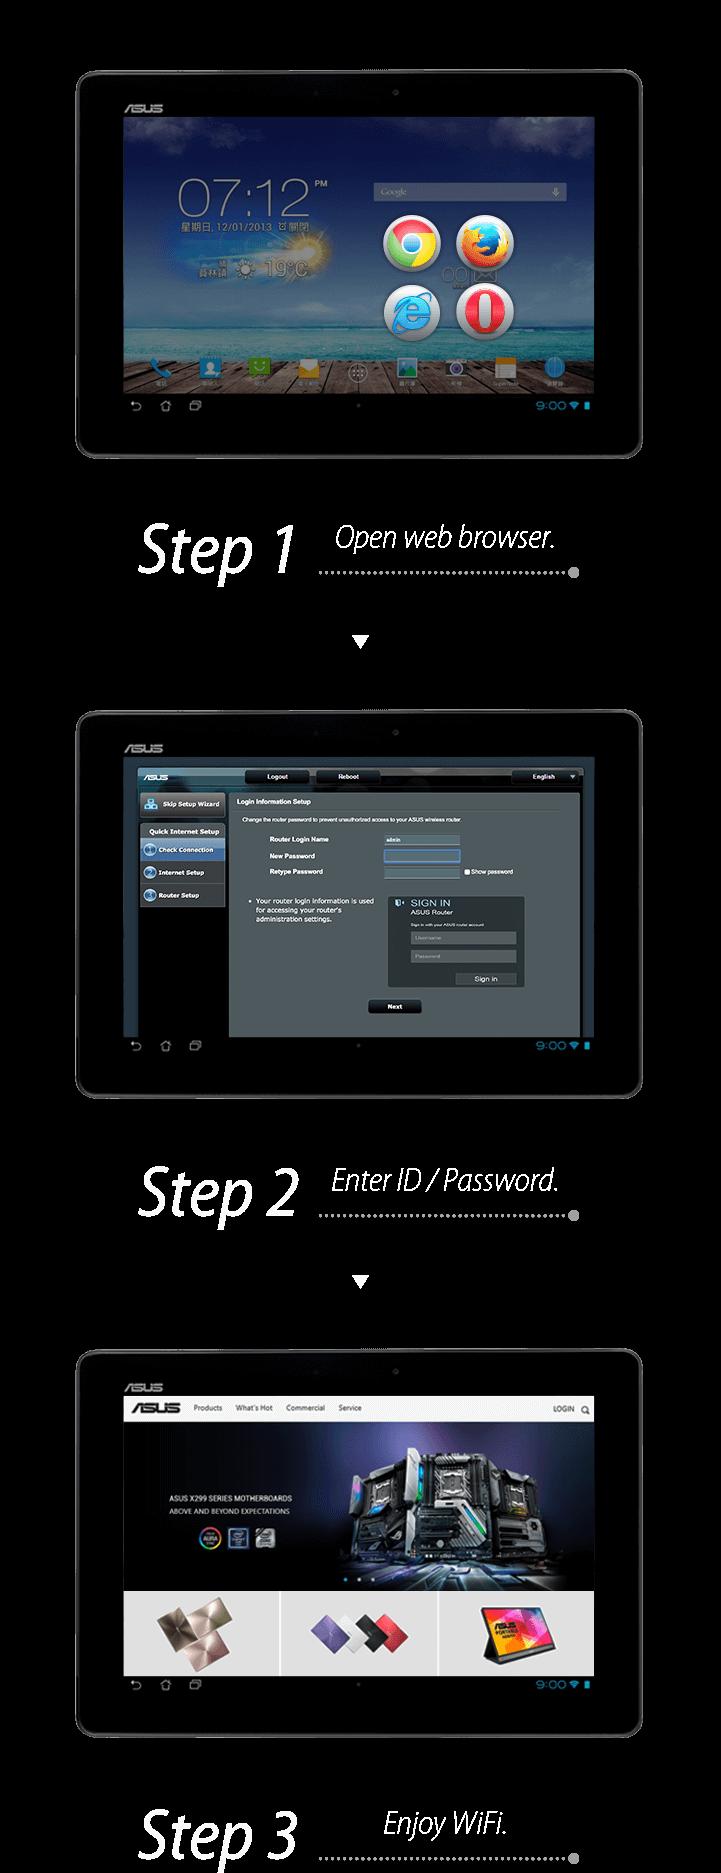 3-step easy setup